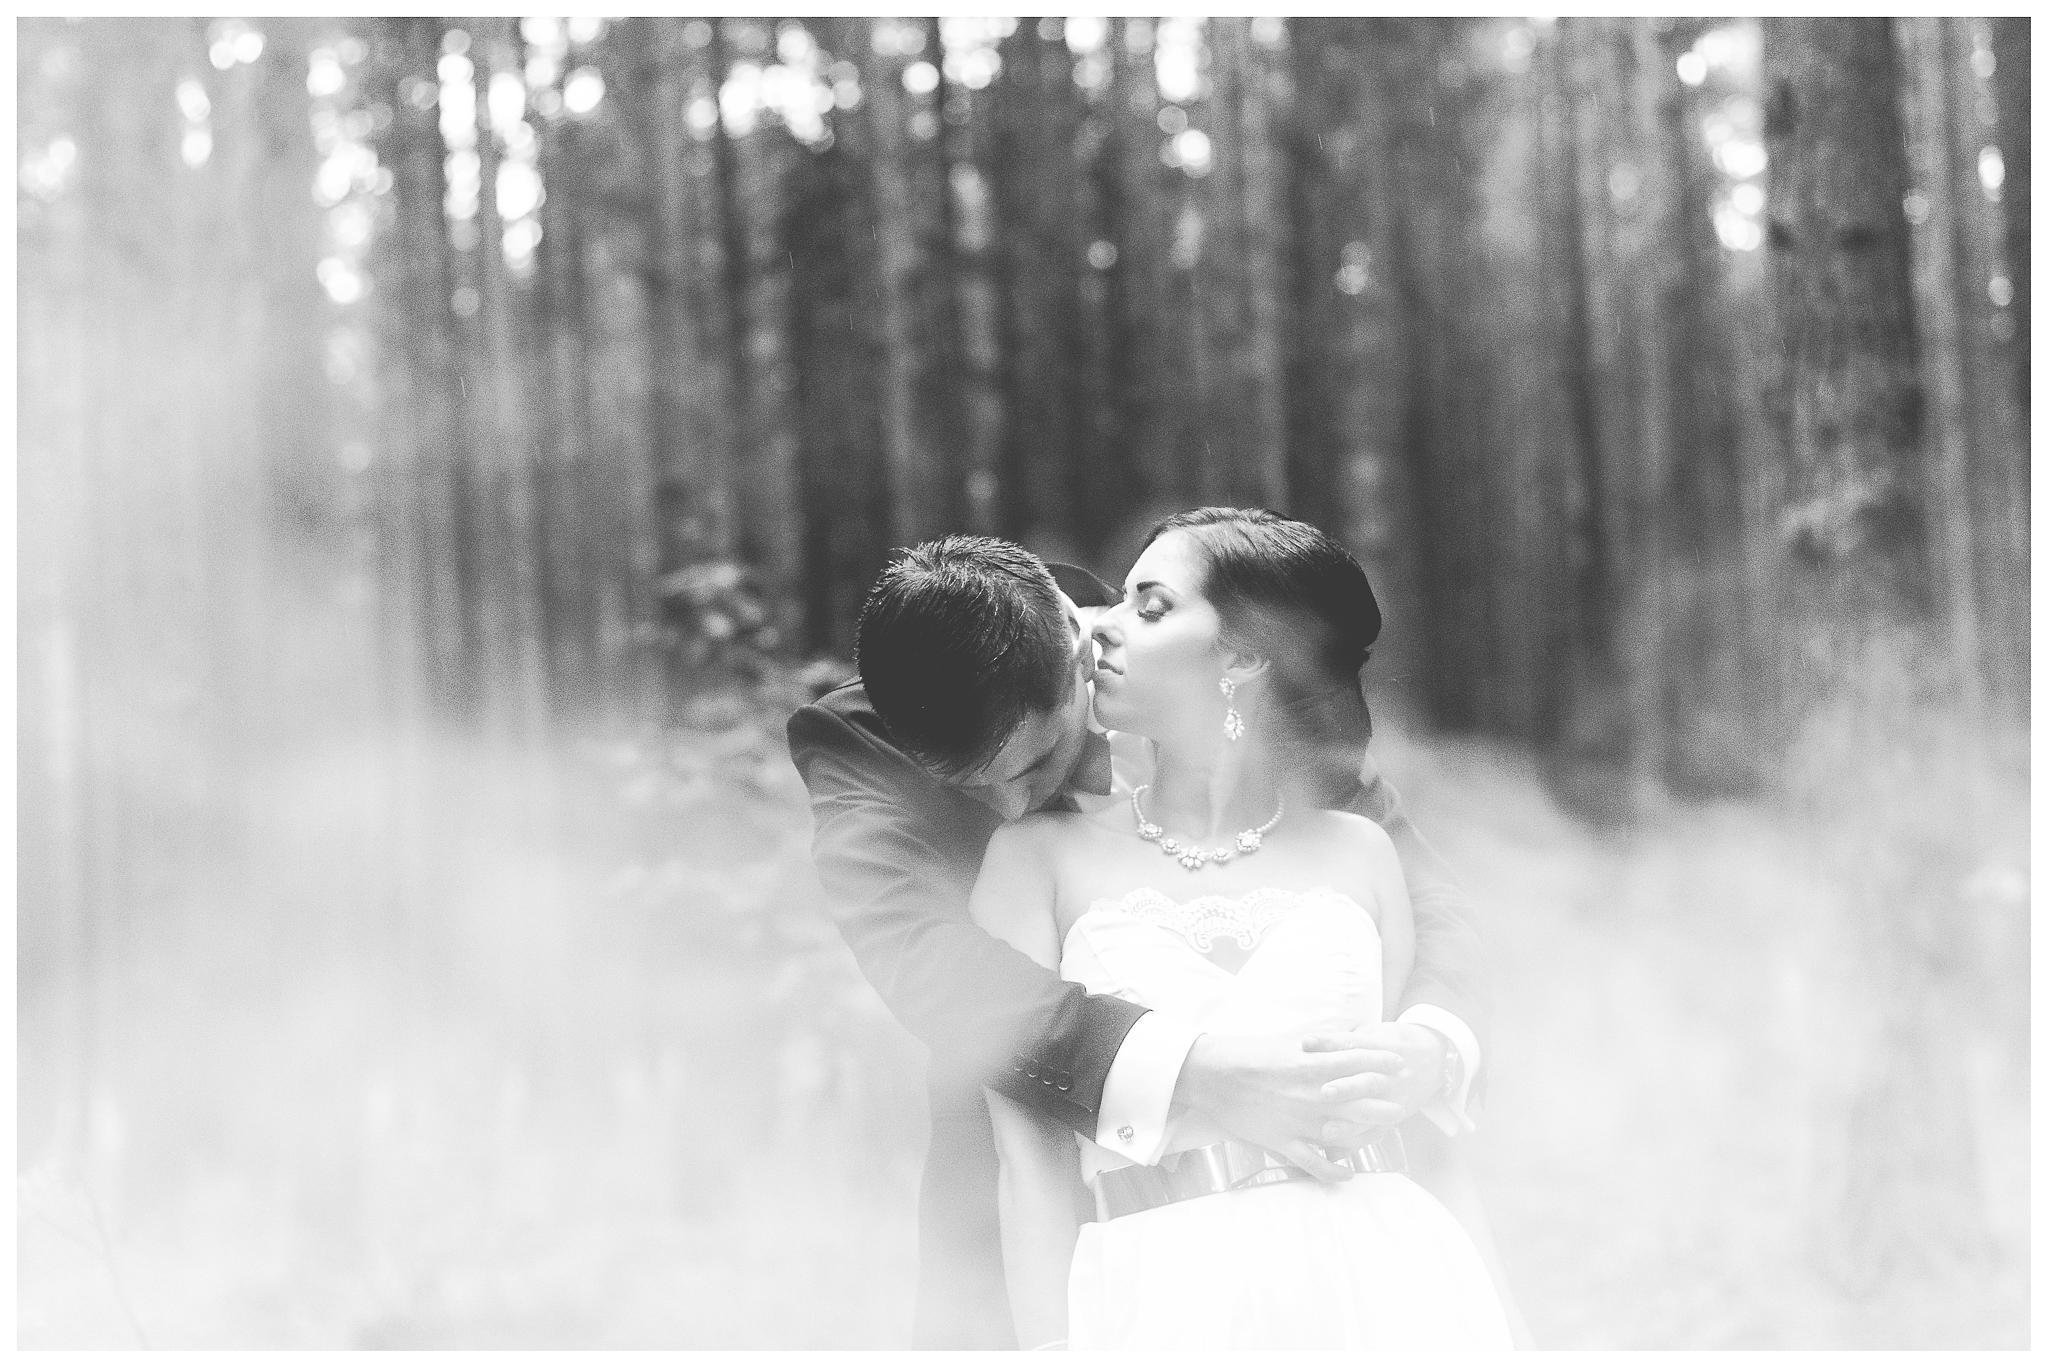 Weddings by Laura Žygė